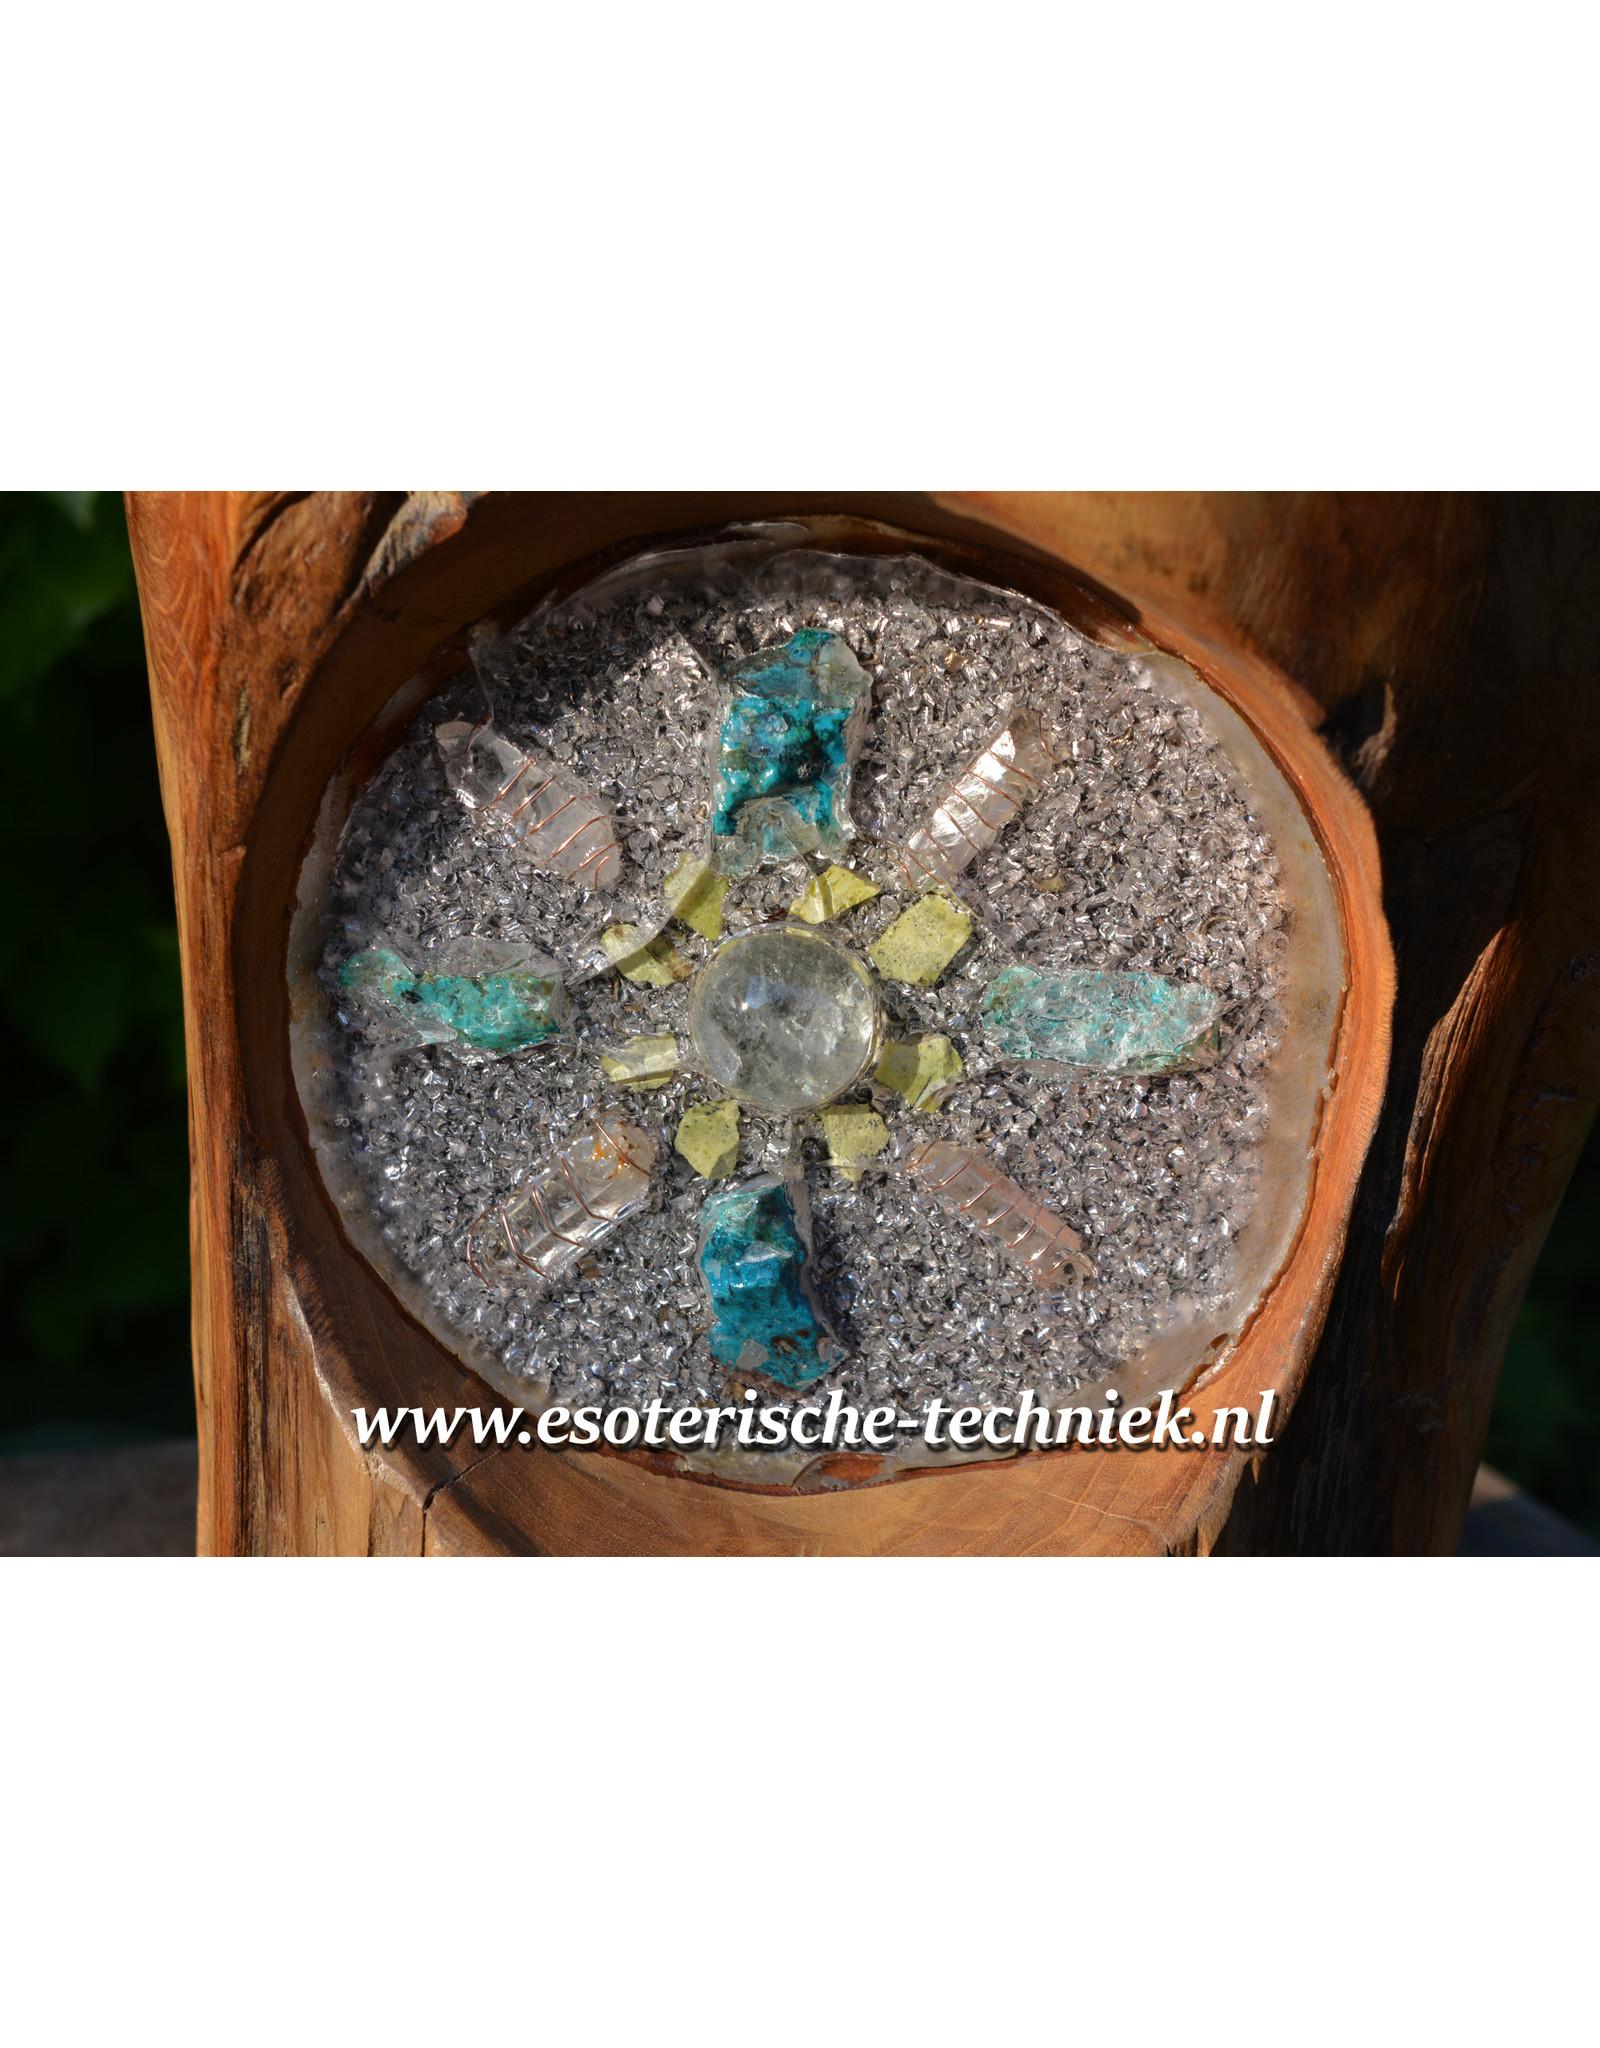 Meditatiekruk met orgonite Geel Turkoois, Shungite, Bergkristal en Chrysocolla